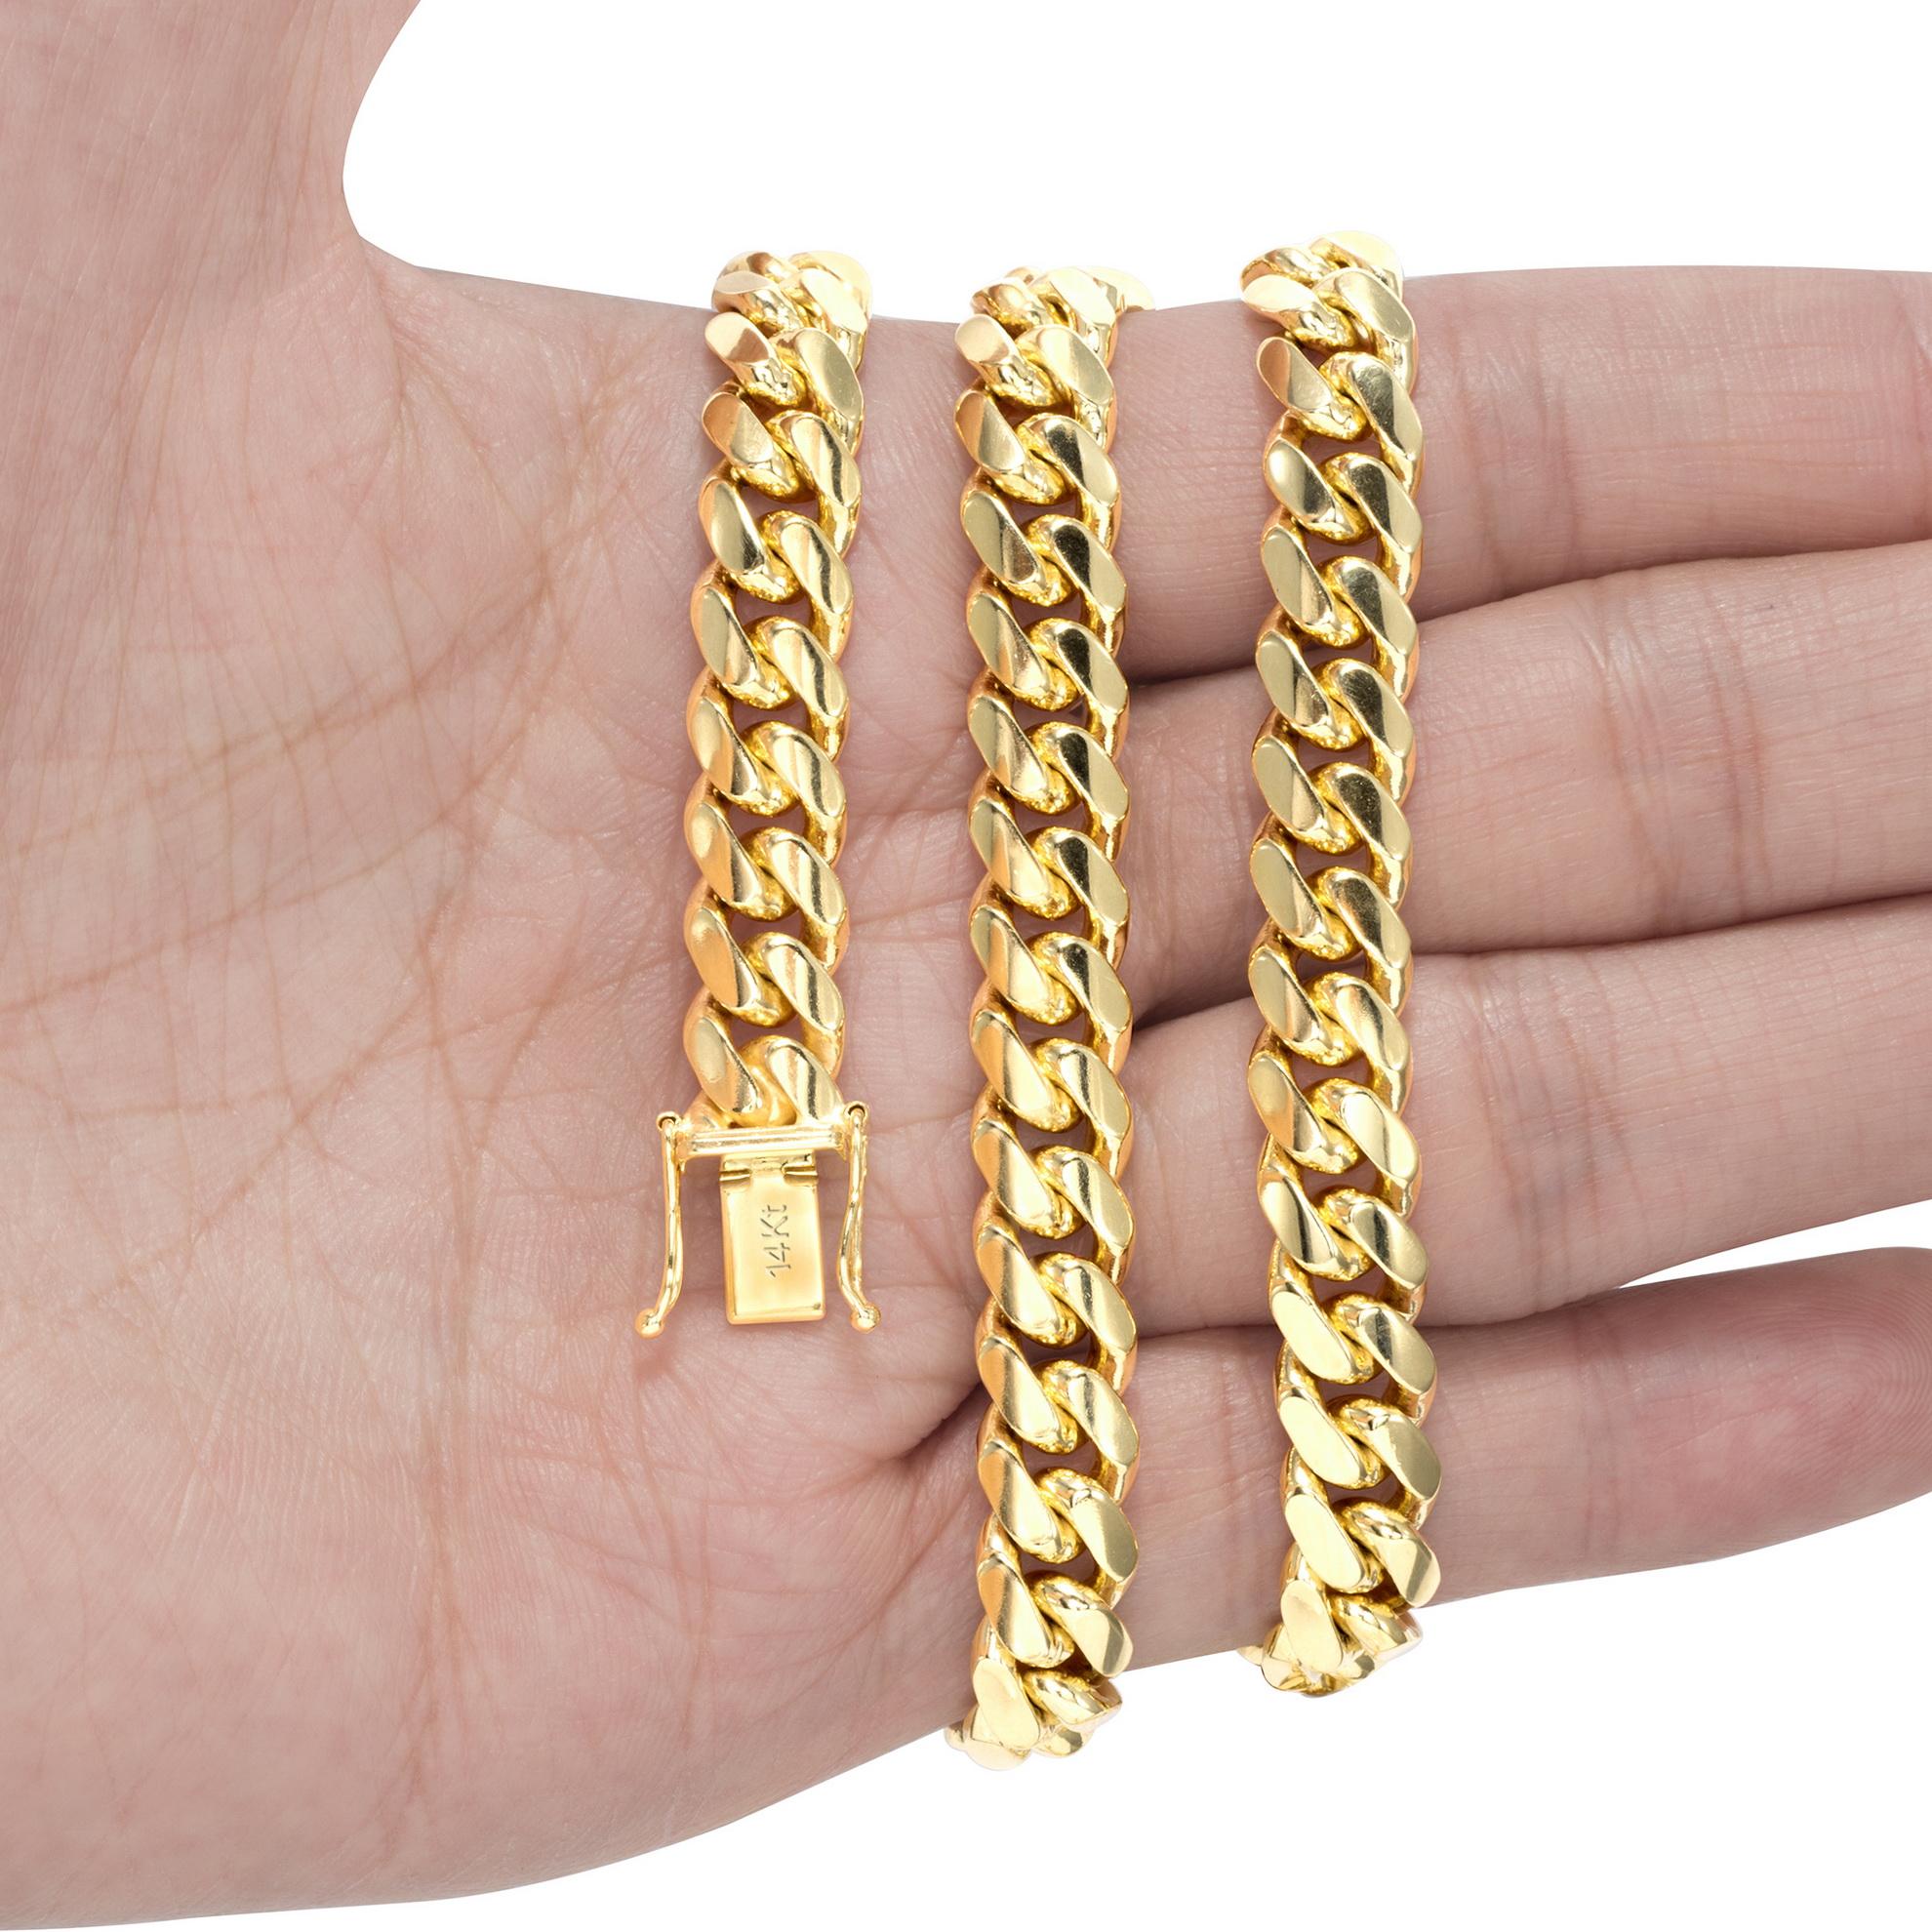 14K-Yellow-Gold-Solid-2-7mm-11mm-Miami-Cuban-Link-Chain-Bracelet-Men-Women-7-034-9-034 thumbnail 25